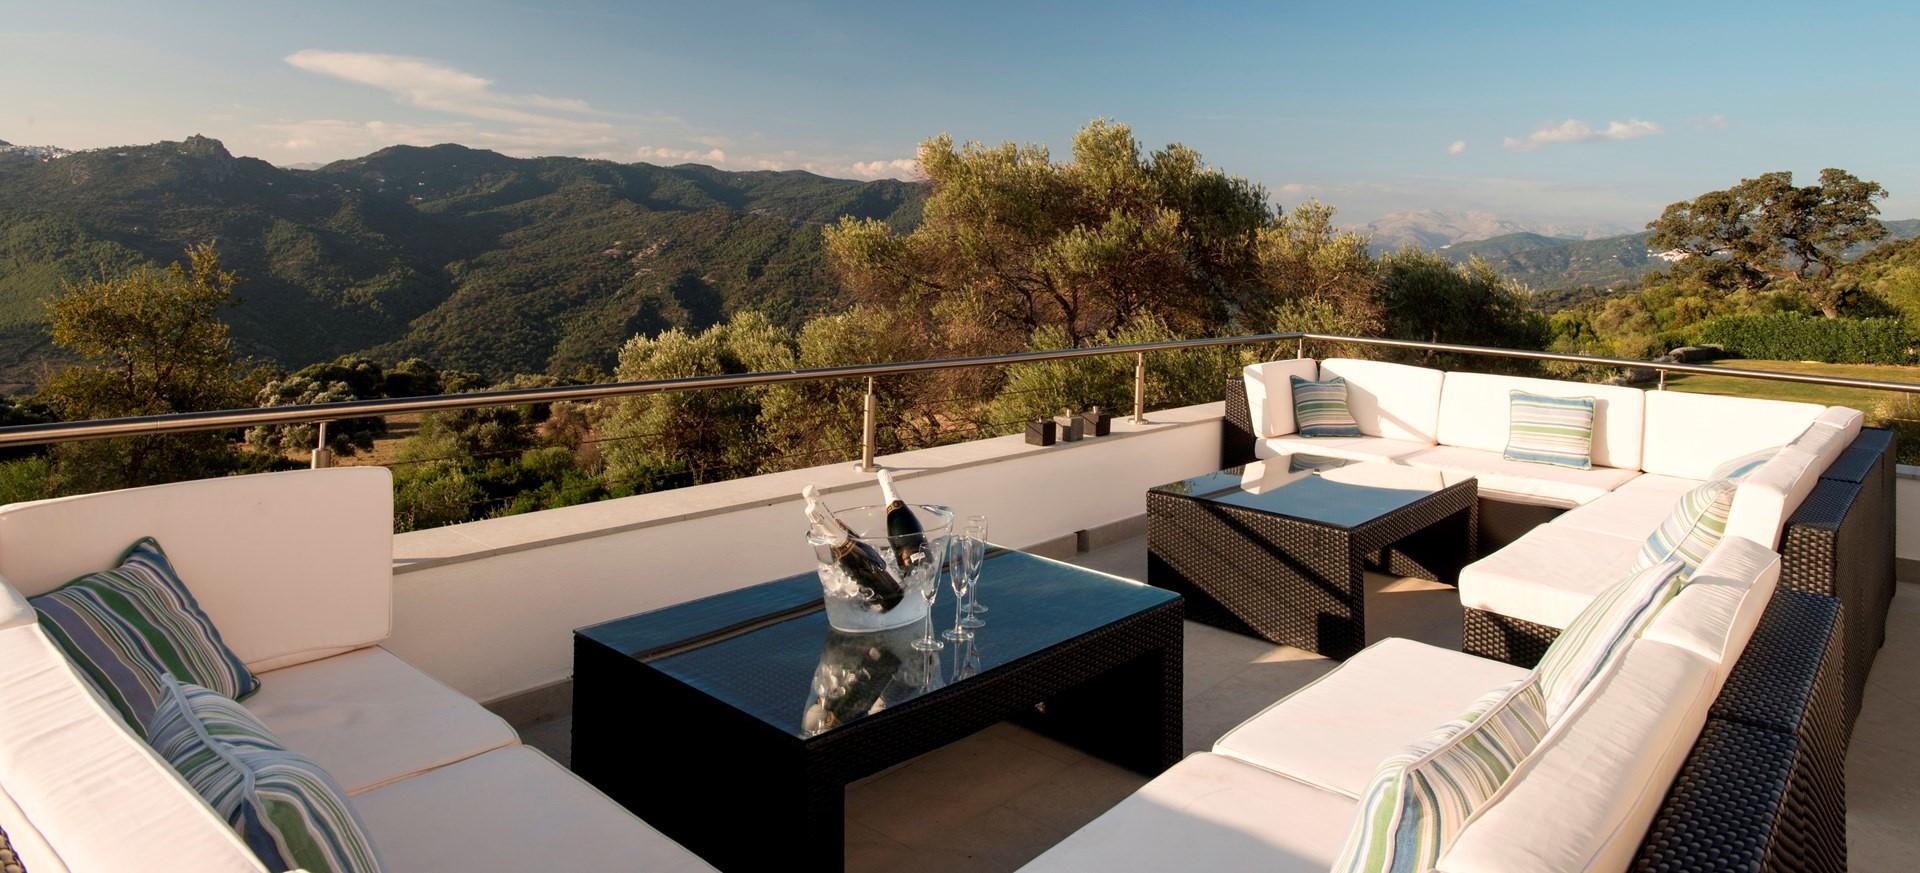 6-bedroom-luxury-villa-andalucia